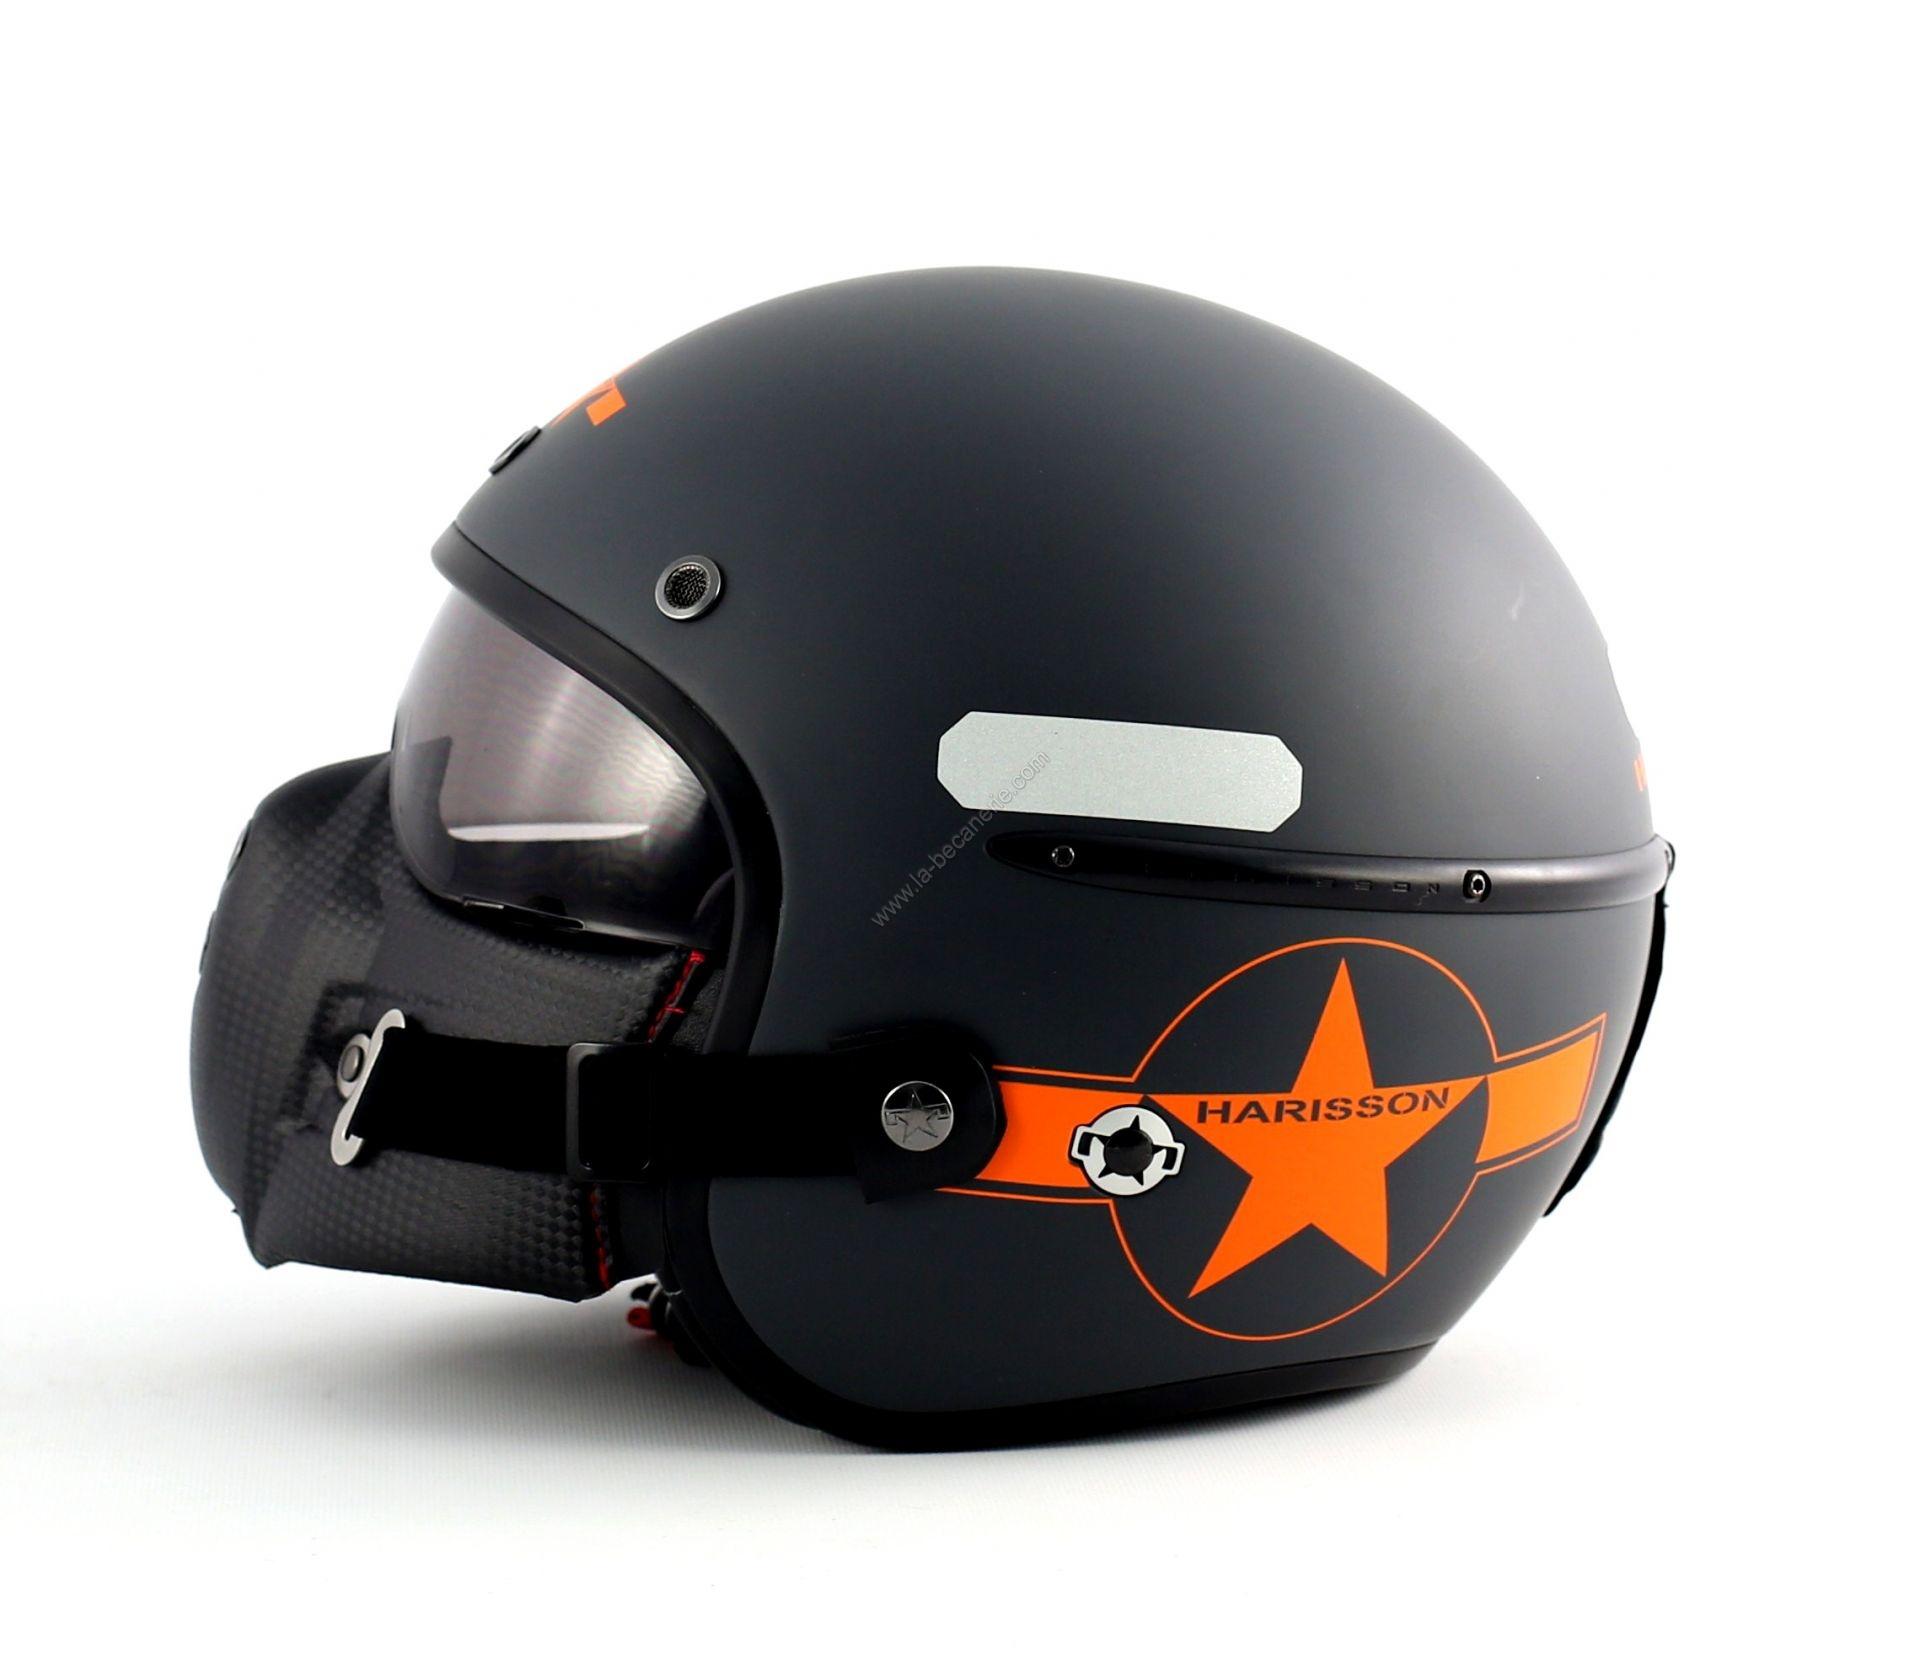 casque transformable chaft harisson corsair star d co gris orange mat casque moto chaft. Black Bedroom Furniture Sets. Home Design Ideas